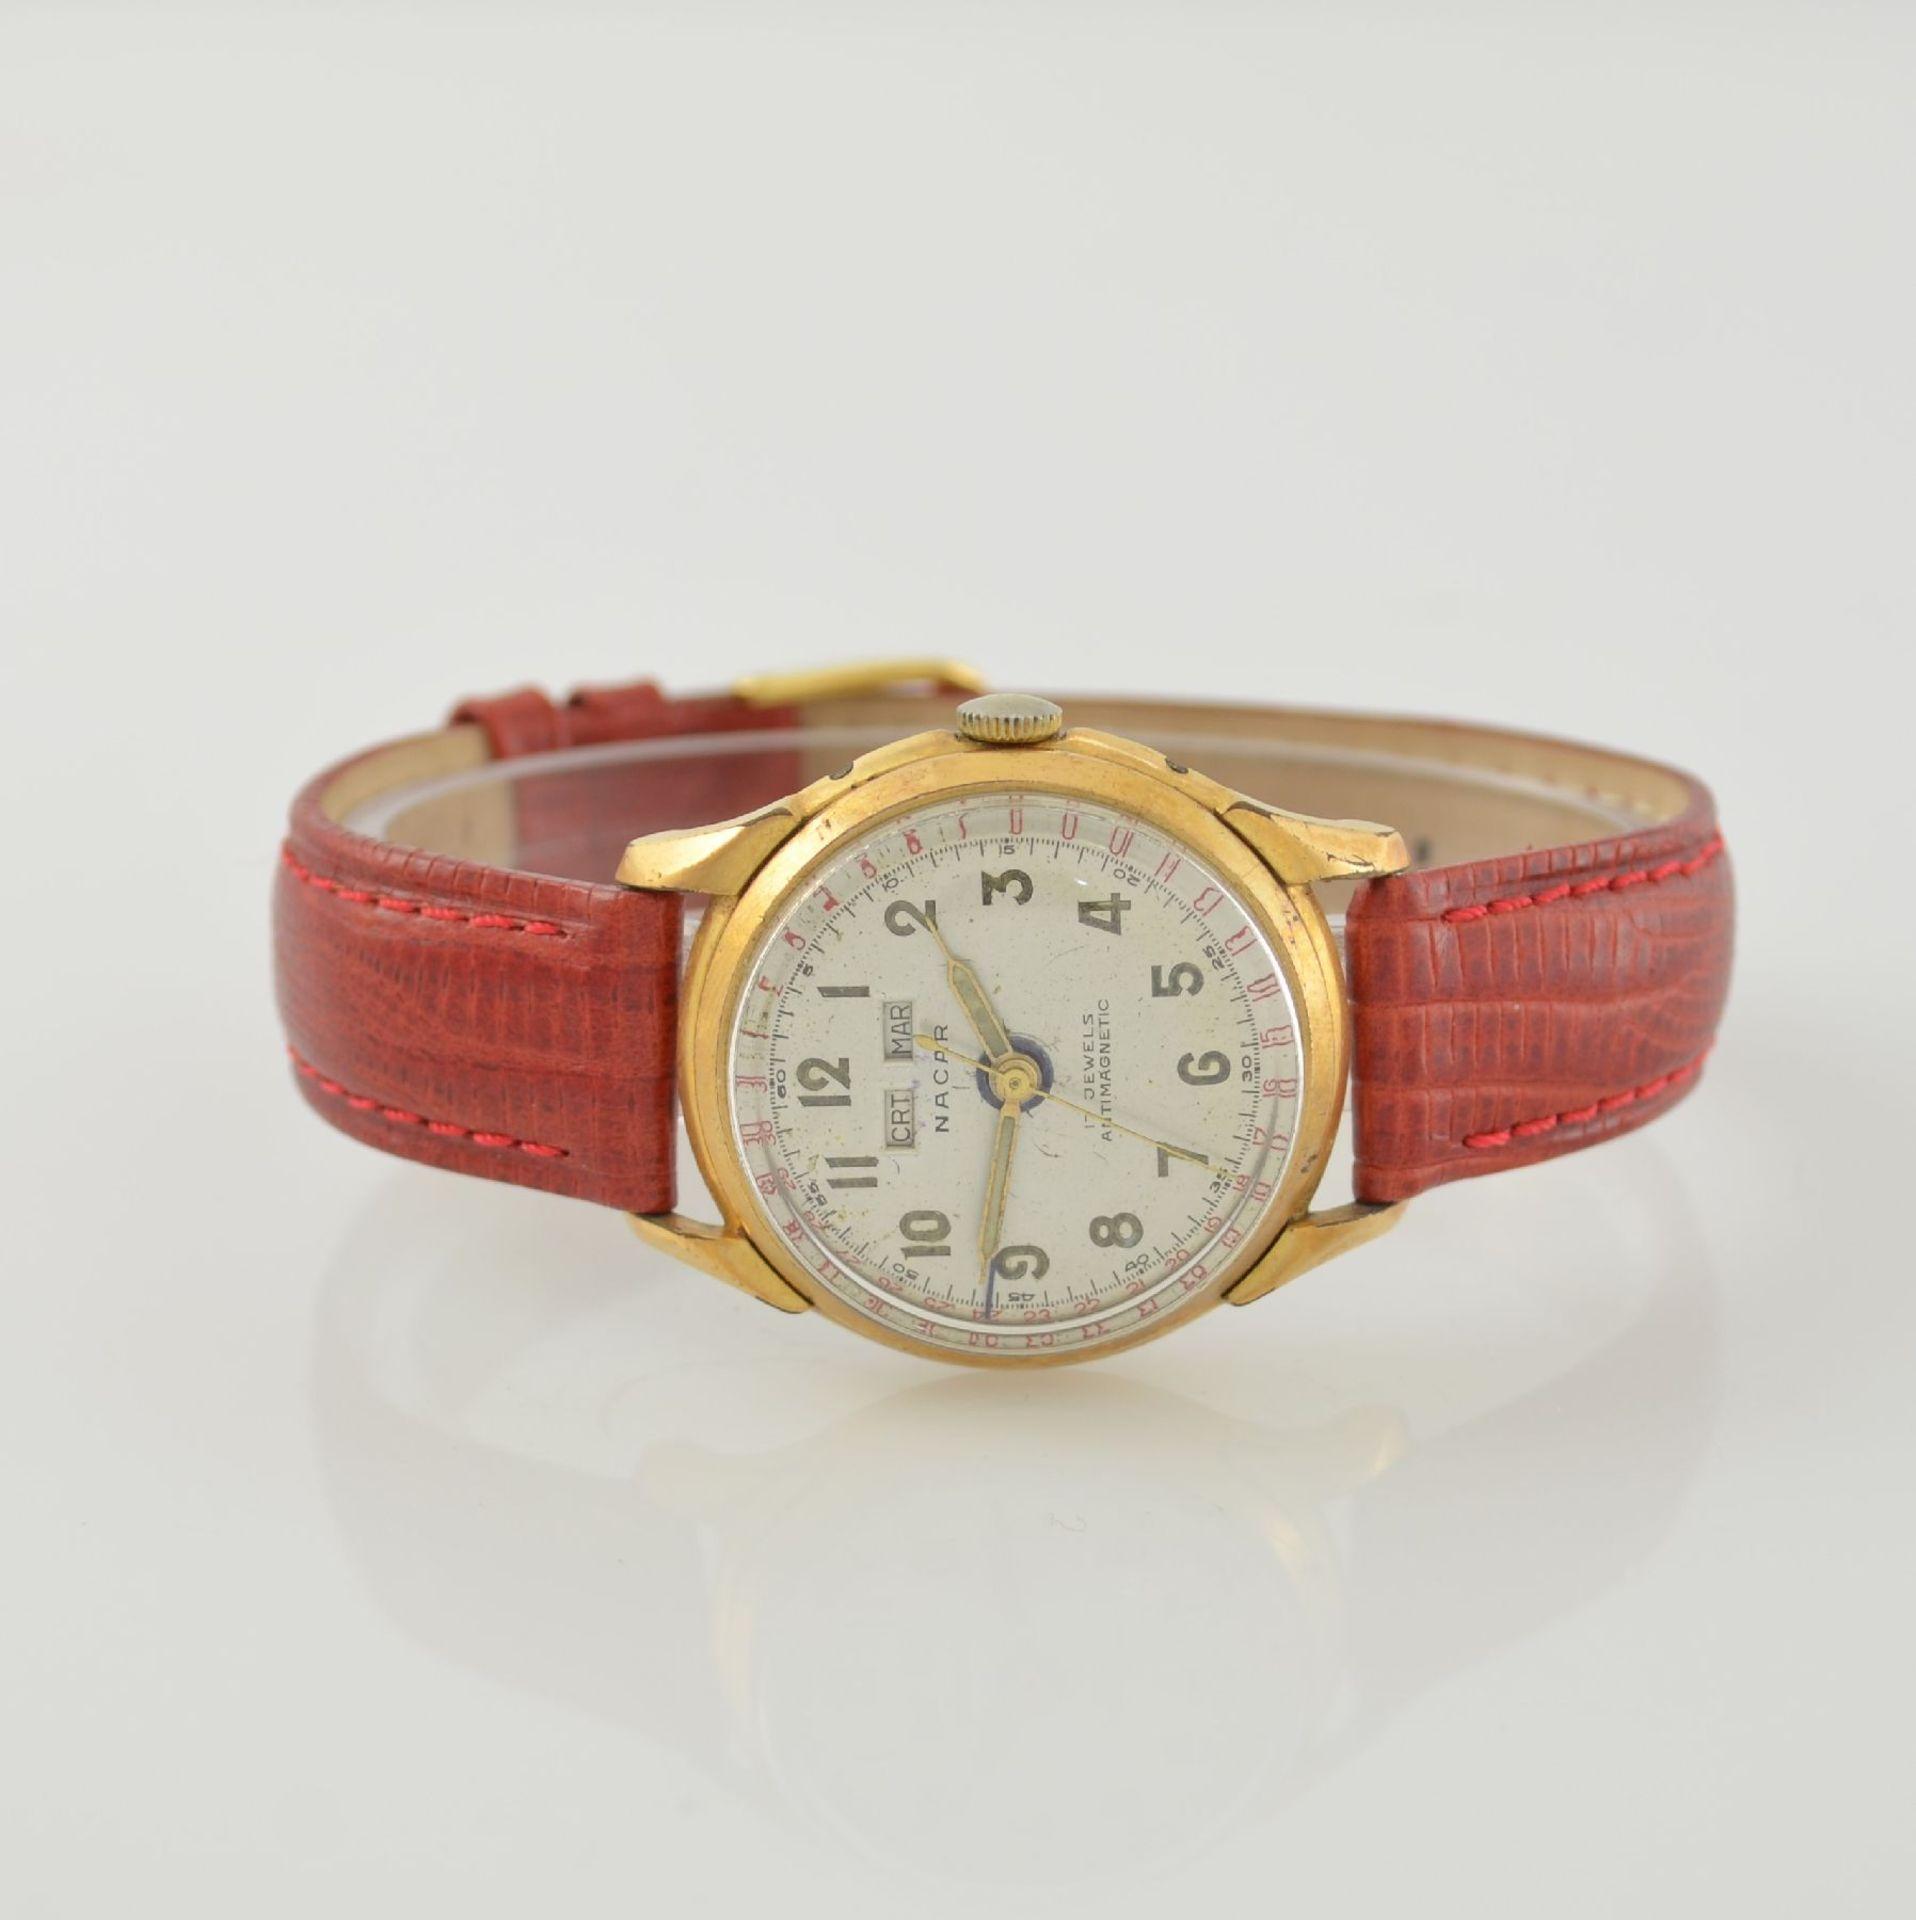 Konvolut: 2 Armbanduhren mit Kalender bzw. Datum, Schweiz um 1950-1960, Handaufzug, 1) NACAR m.